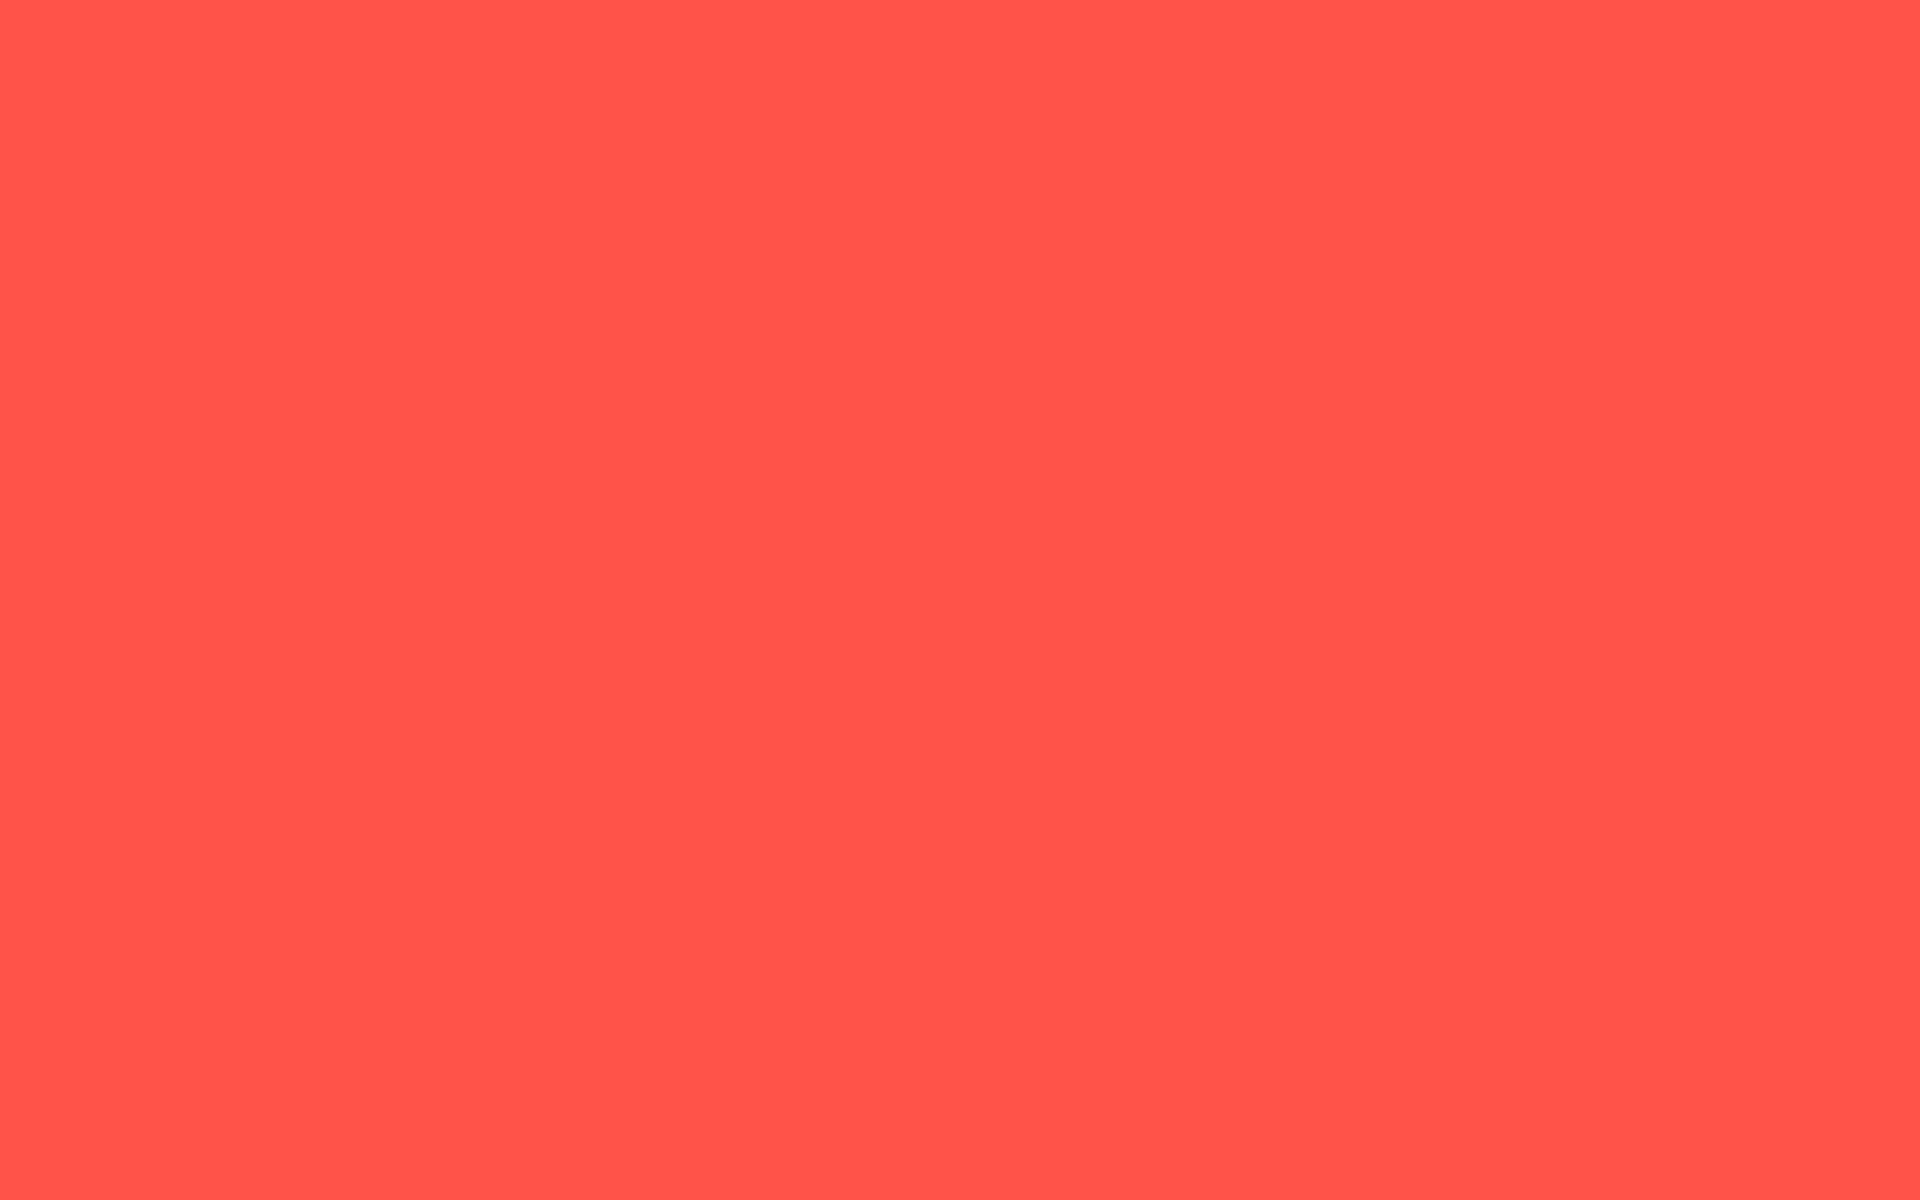 1920x1200 Red-orange Solid Color Background